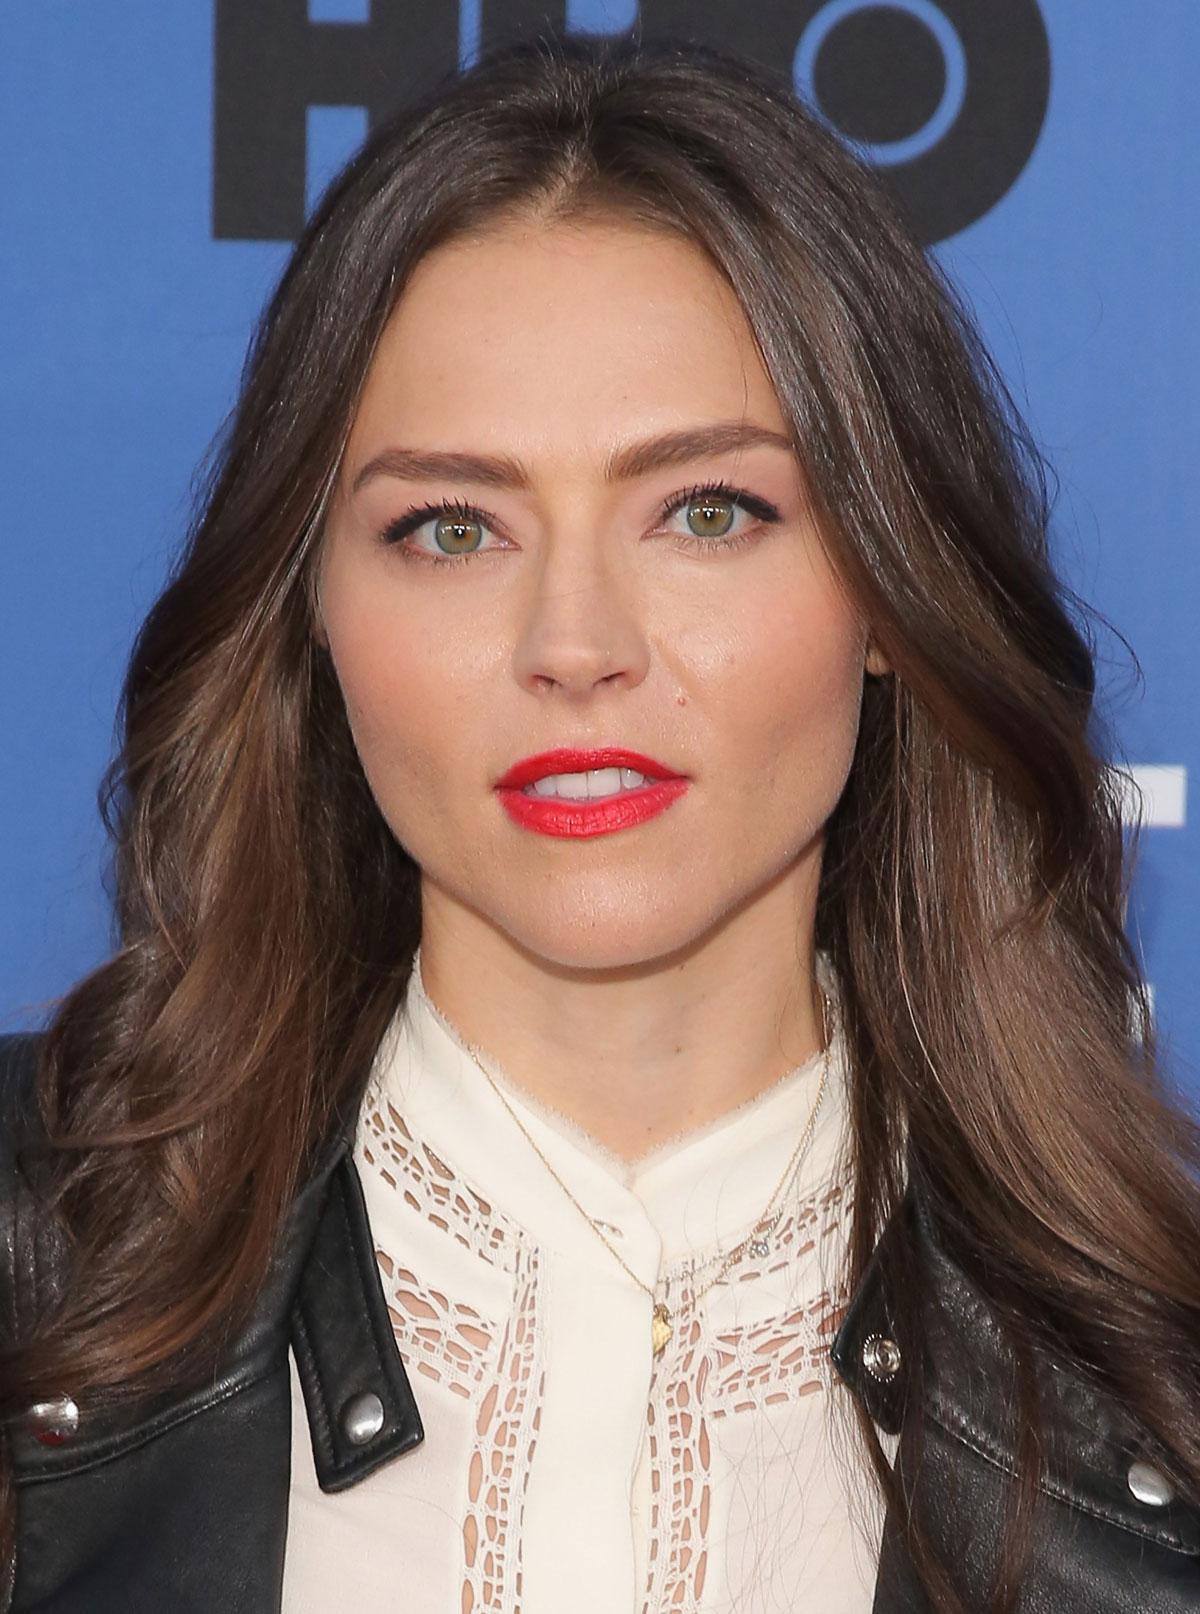 Trieste Kelly Dunn attends Olive Kitteridge New York Premiere